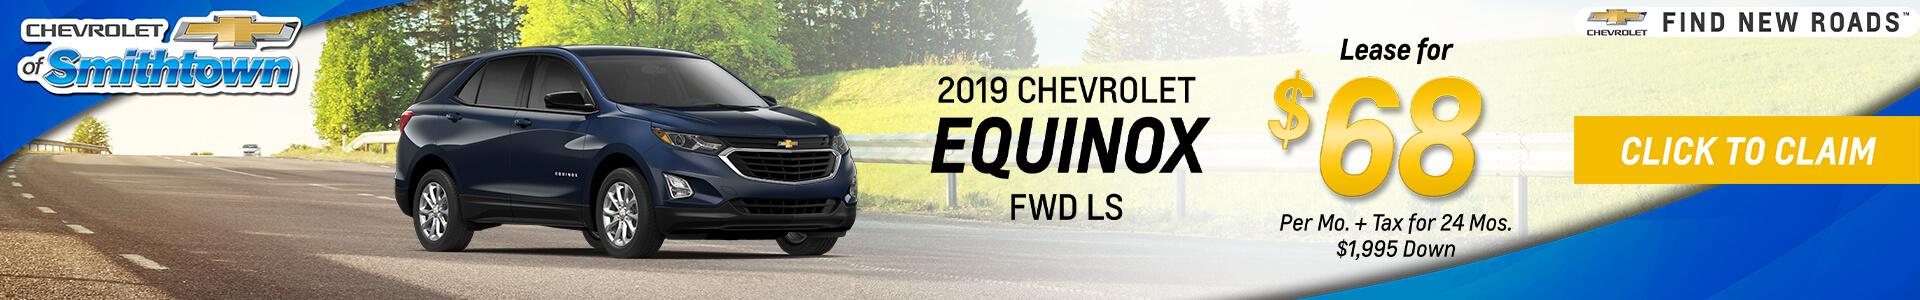 Chevrolet Equinox $68 Lease